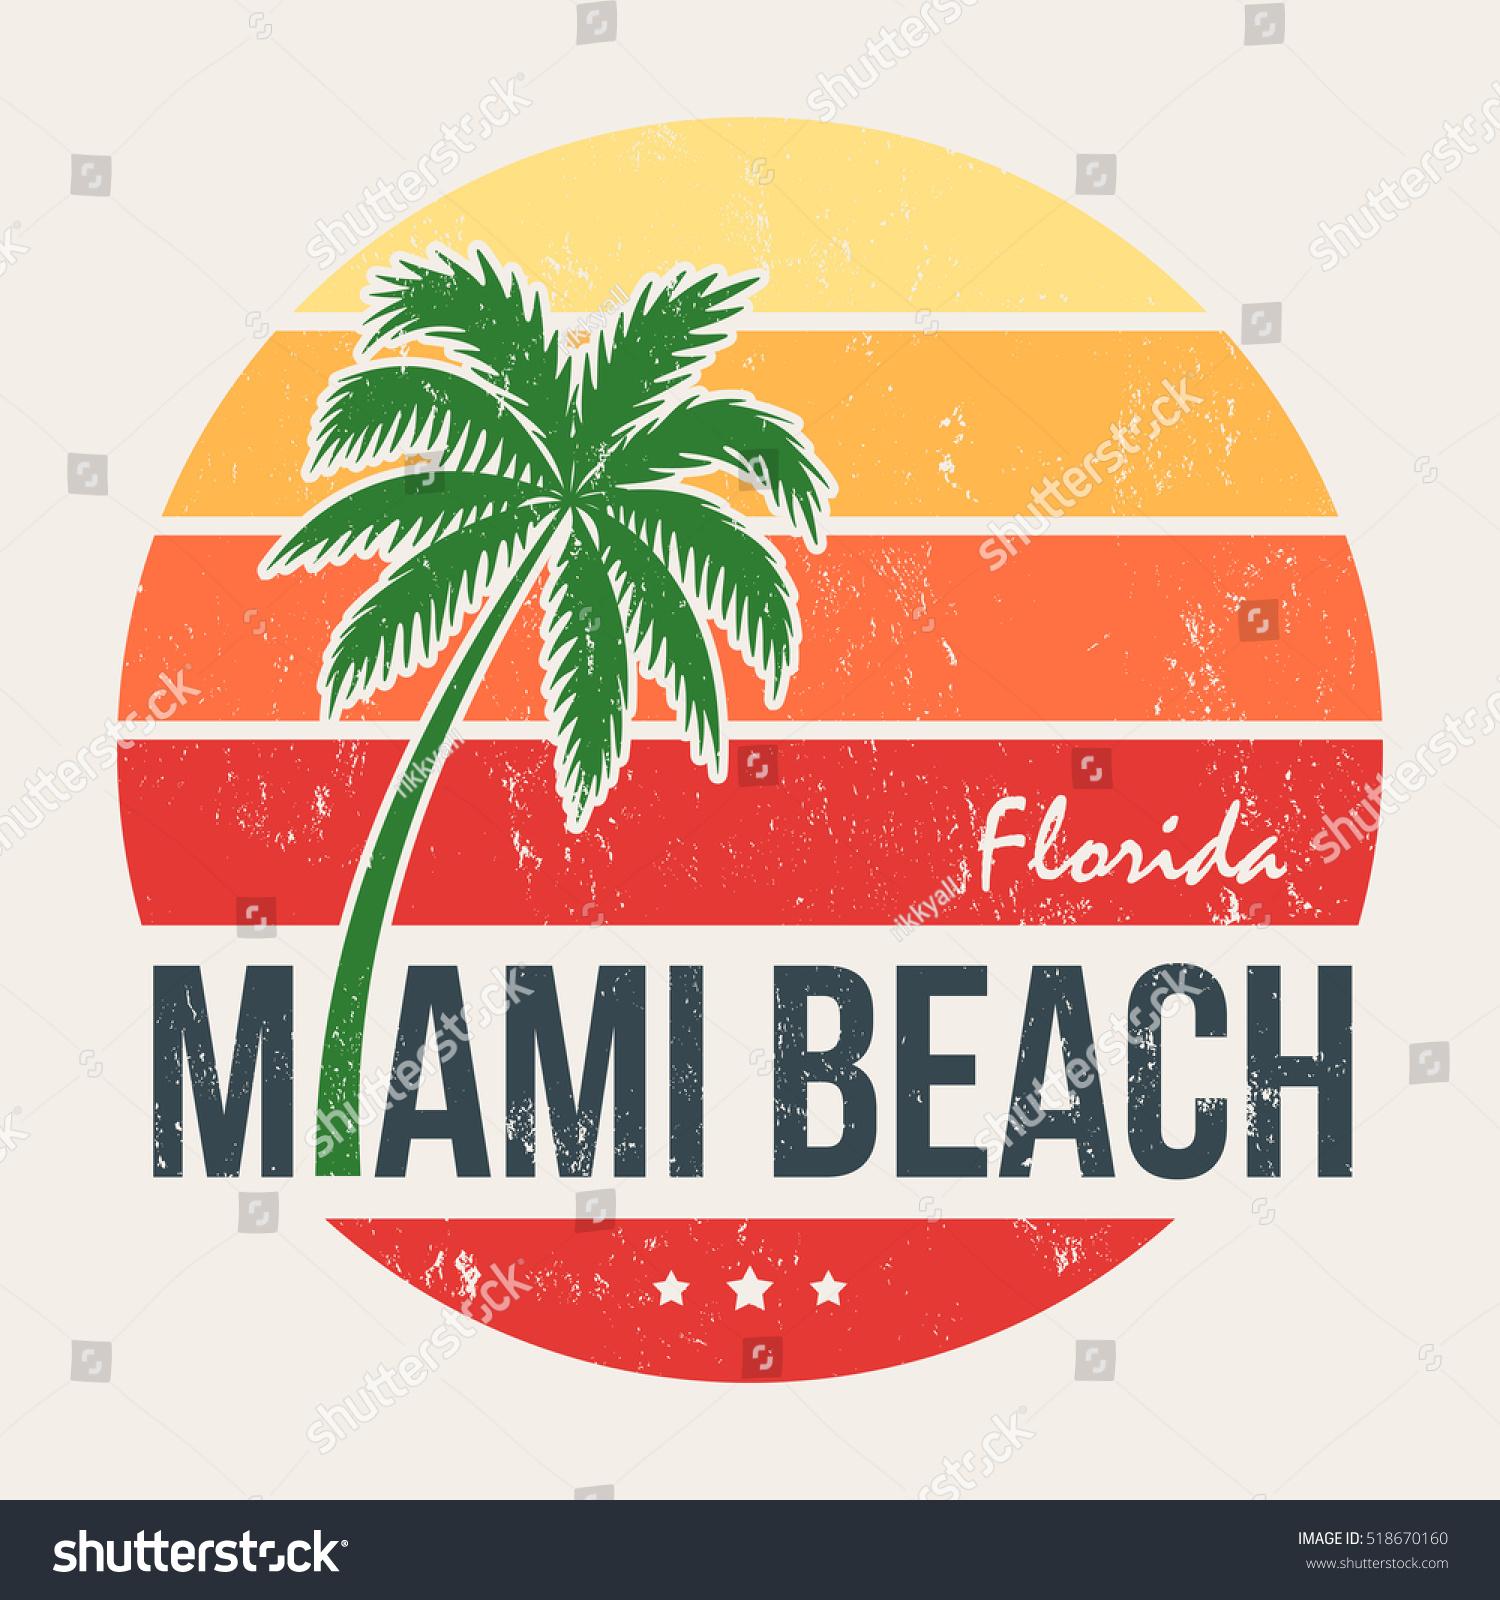 Miami beach florida tee print palm image vectorielle for T shirt printing miami fl